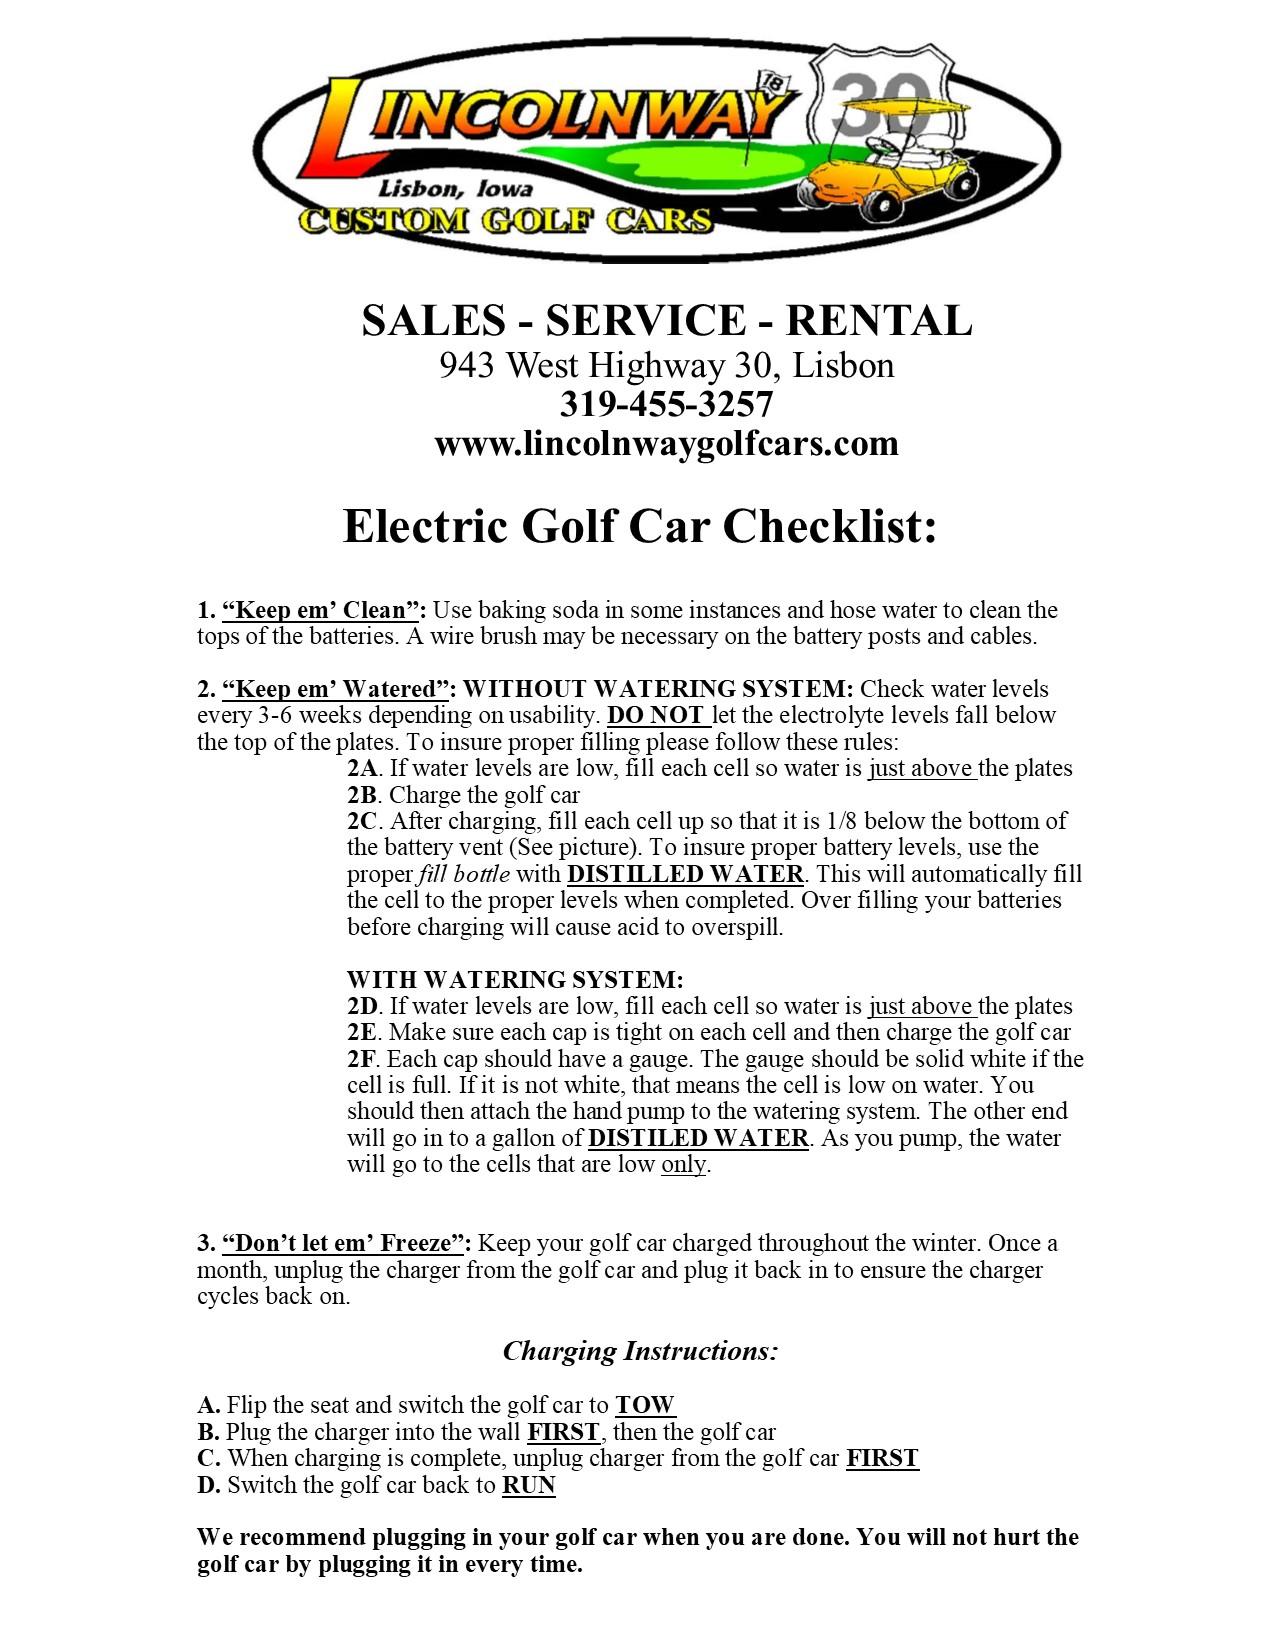 Golf Car Charging Instructions